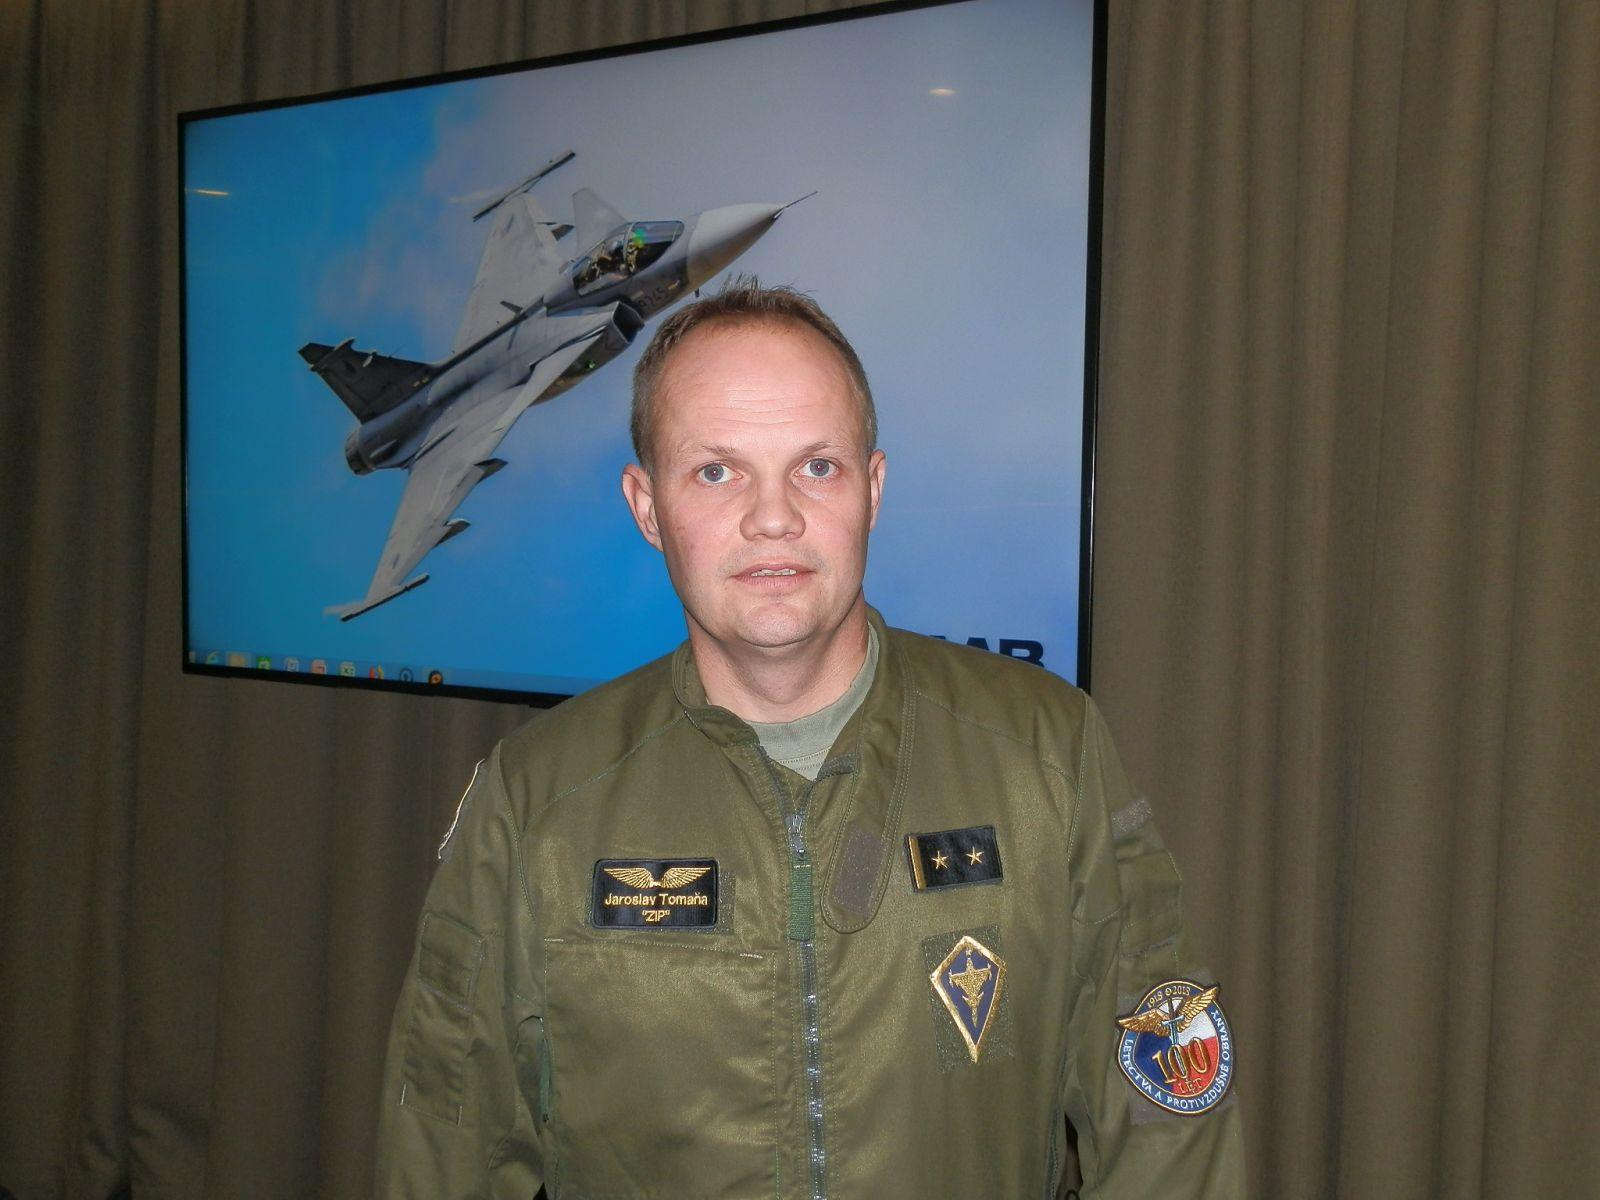 Подполковник   Ярослав  Томана :  Gripen C/D е прекрасен самолет